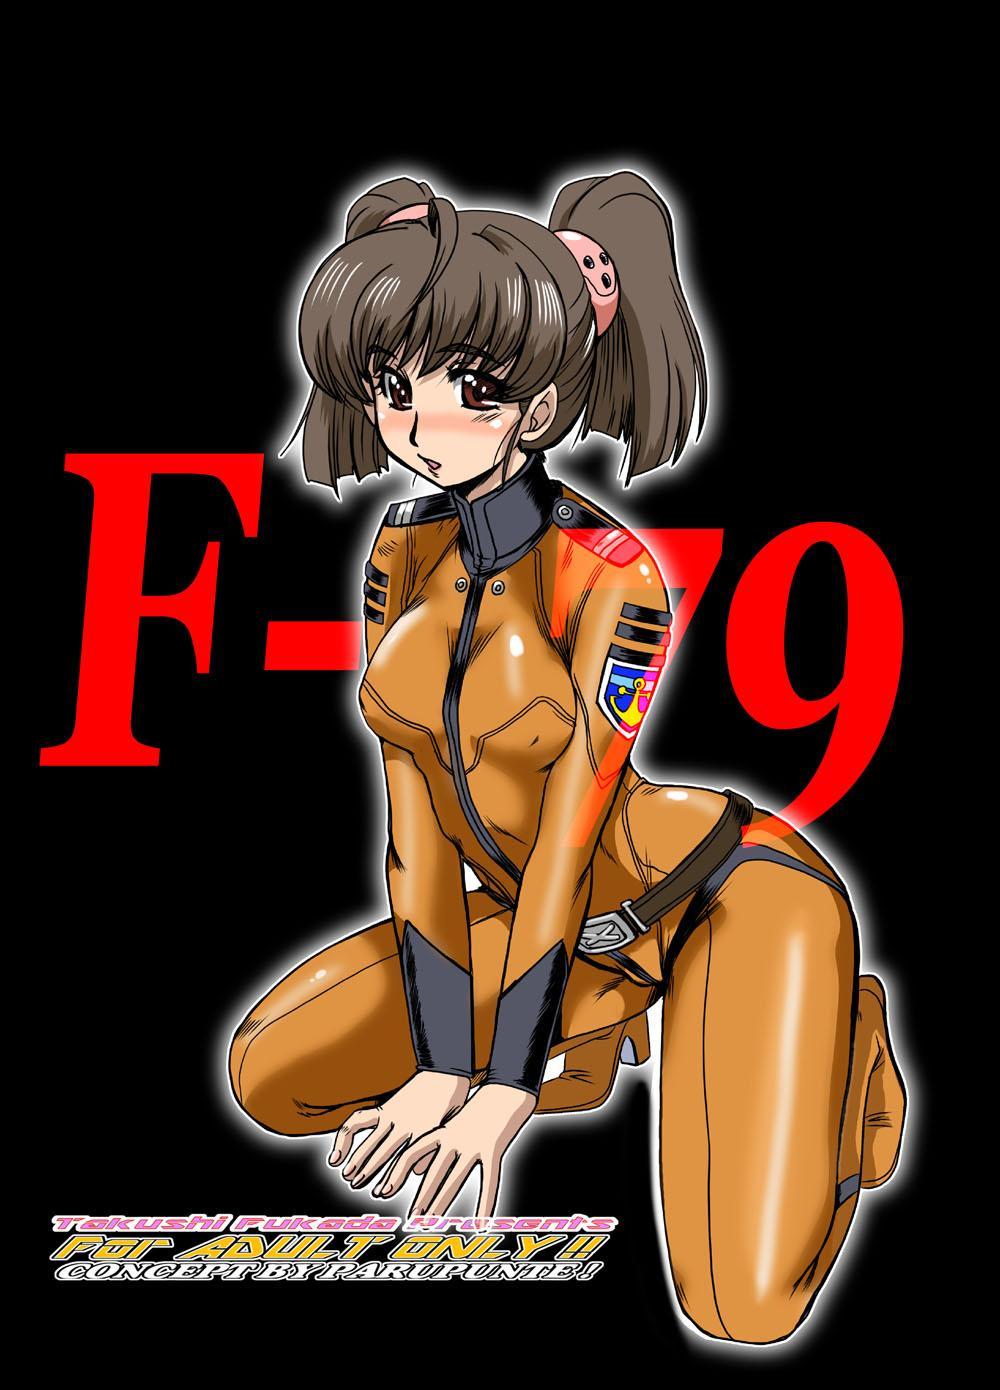 F-79 66